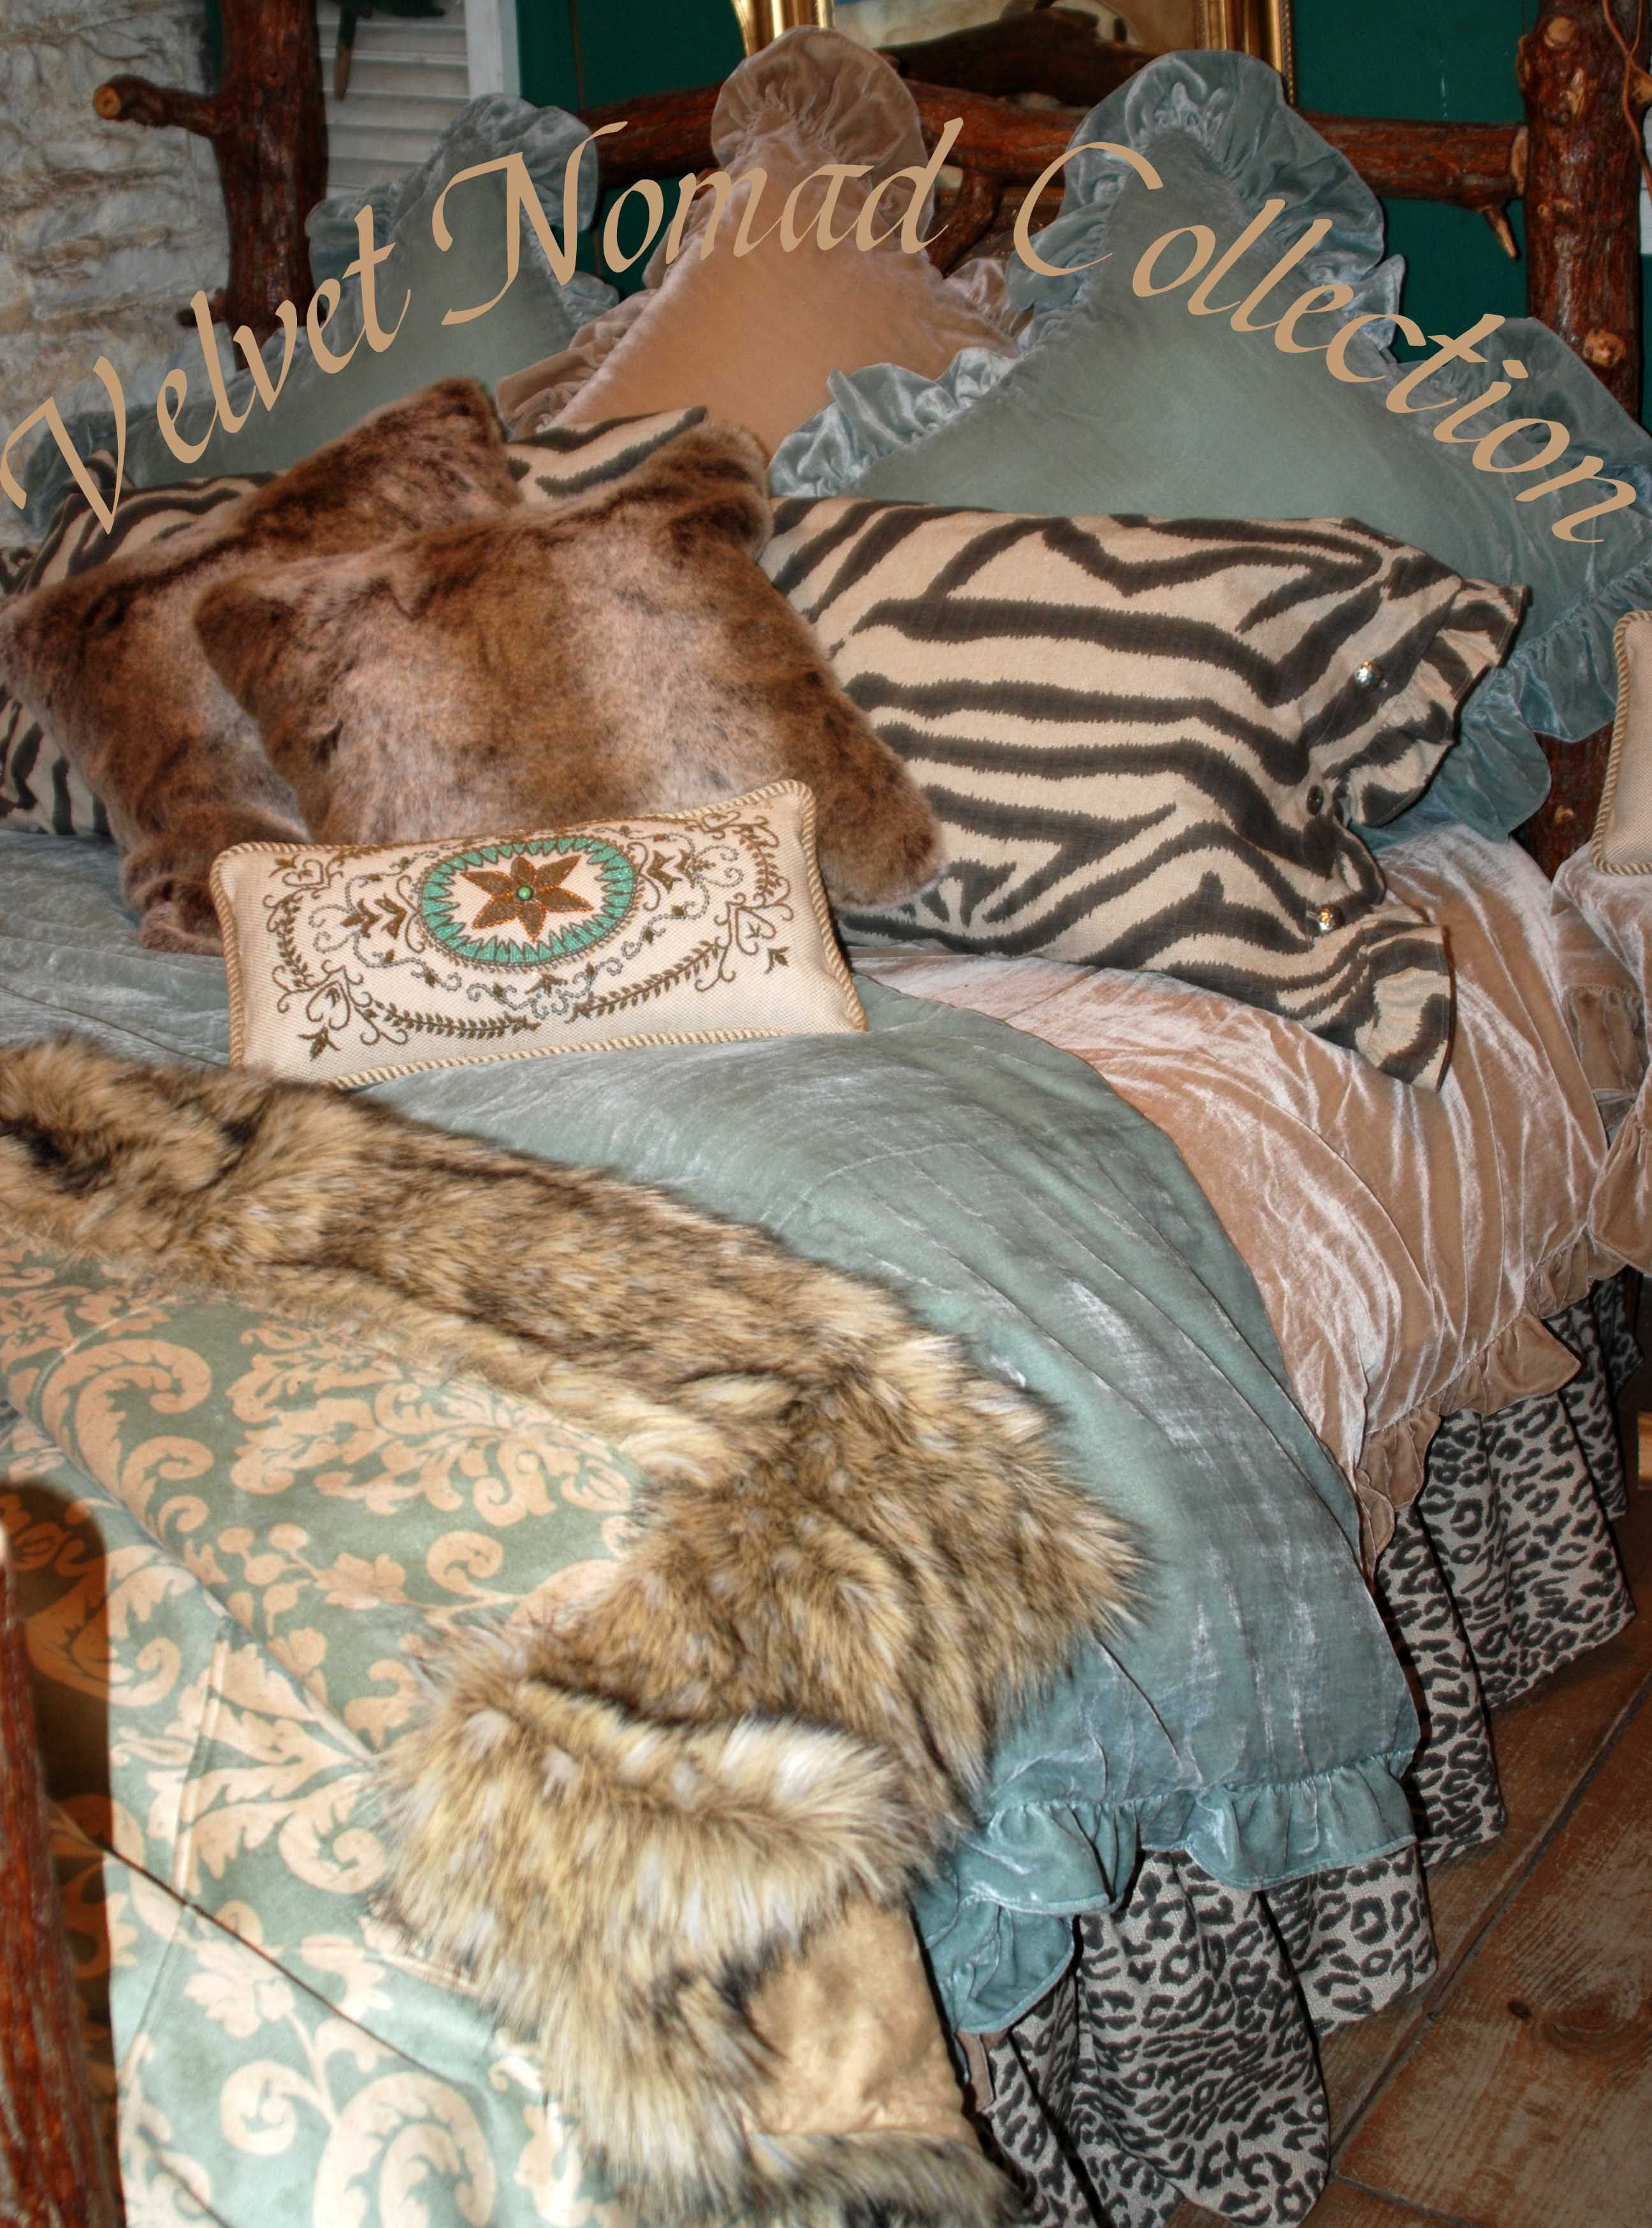 Tasha Polizzi Bedding Velvet Nomad Collection Fall 2011